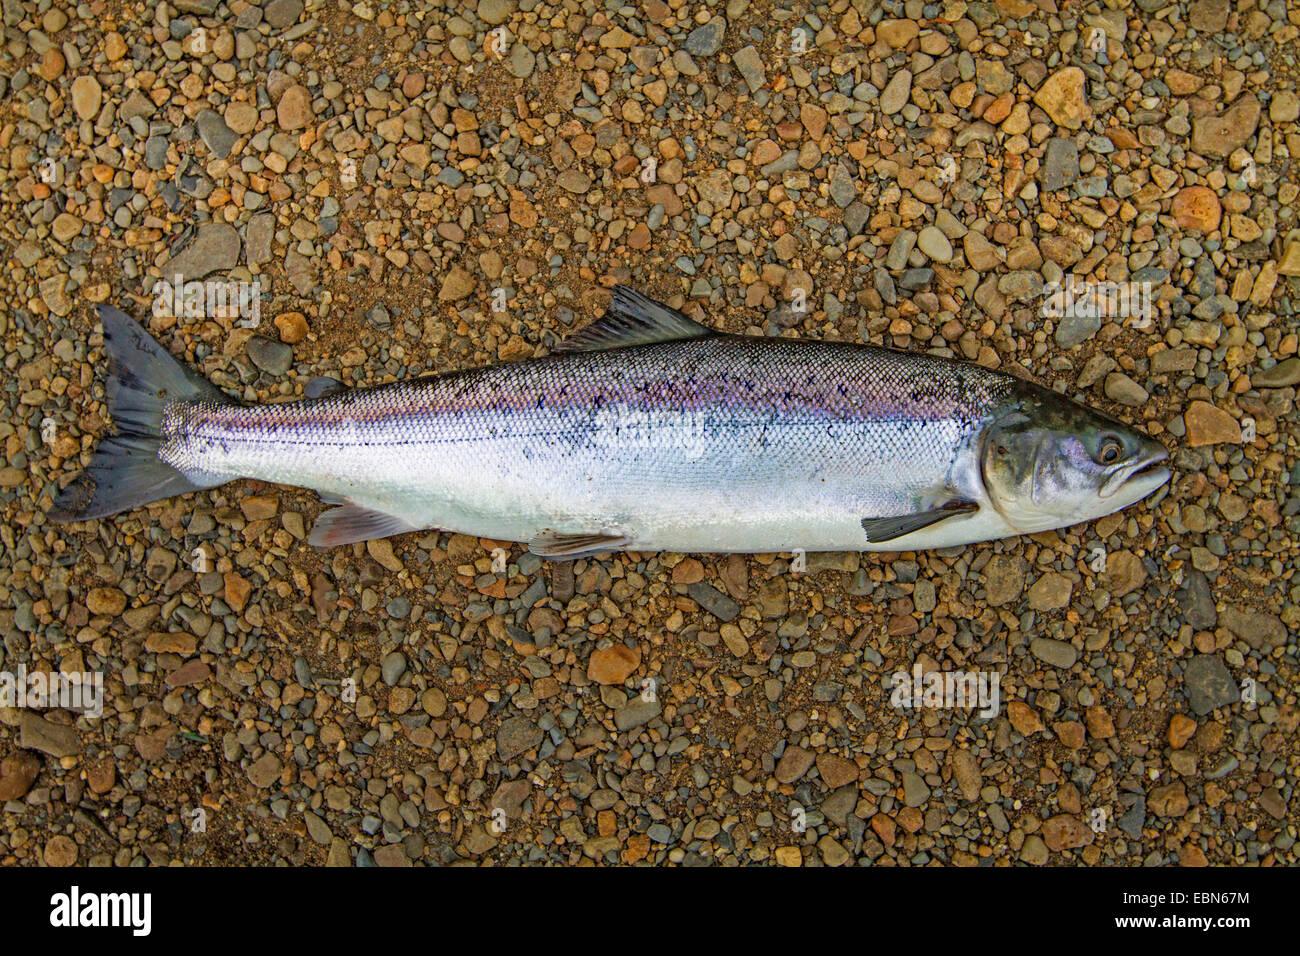 Atlantic salmon, ouananiche, lake Atlantic salmon, landlocked salmon, Sebago salmon (Salmo salar), smolt, Ireland, - Stock Image